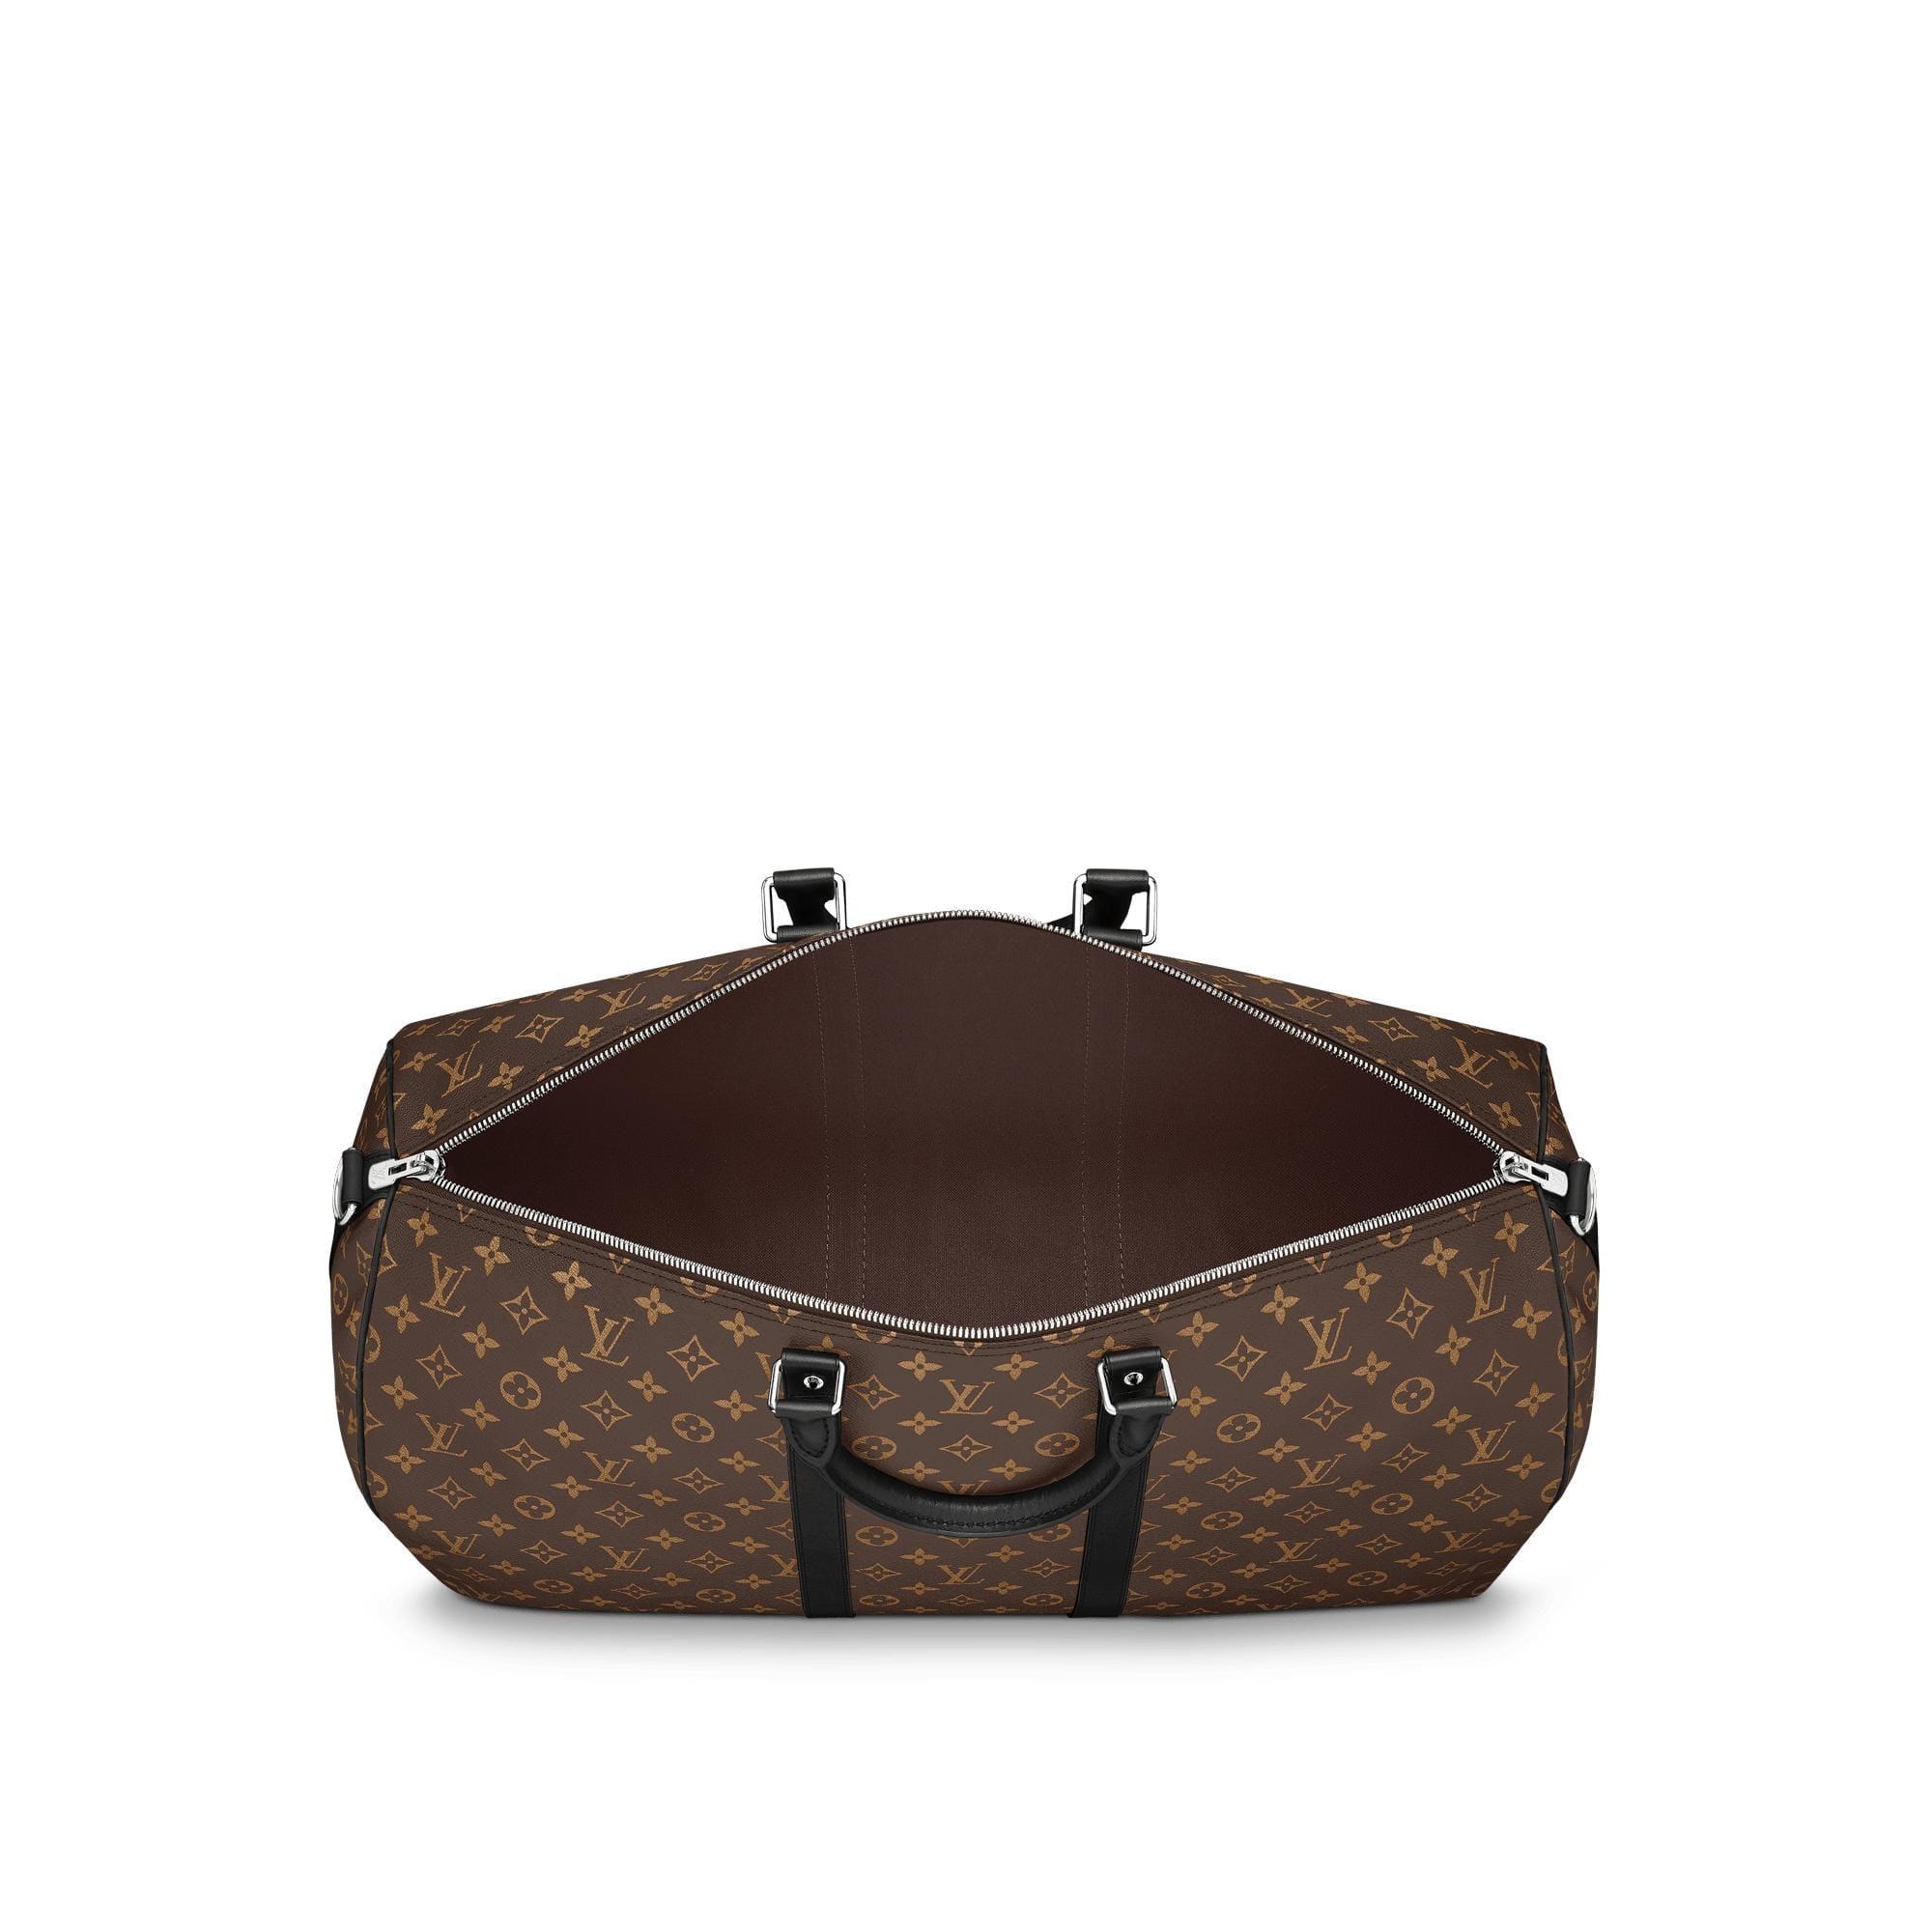 Louis Vuitton Keepall Bandouliere Monogram Macassar (With Accessories) 55 Brown/Black